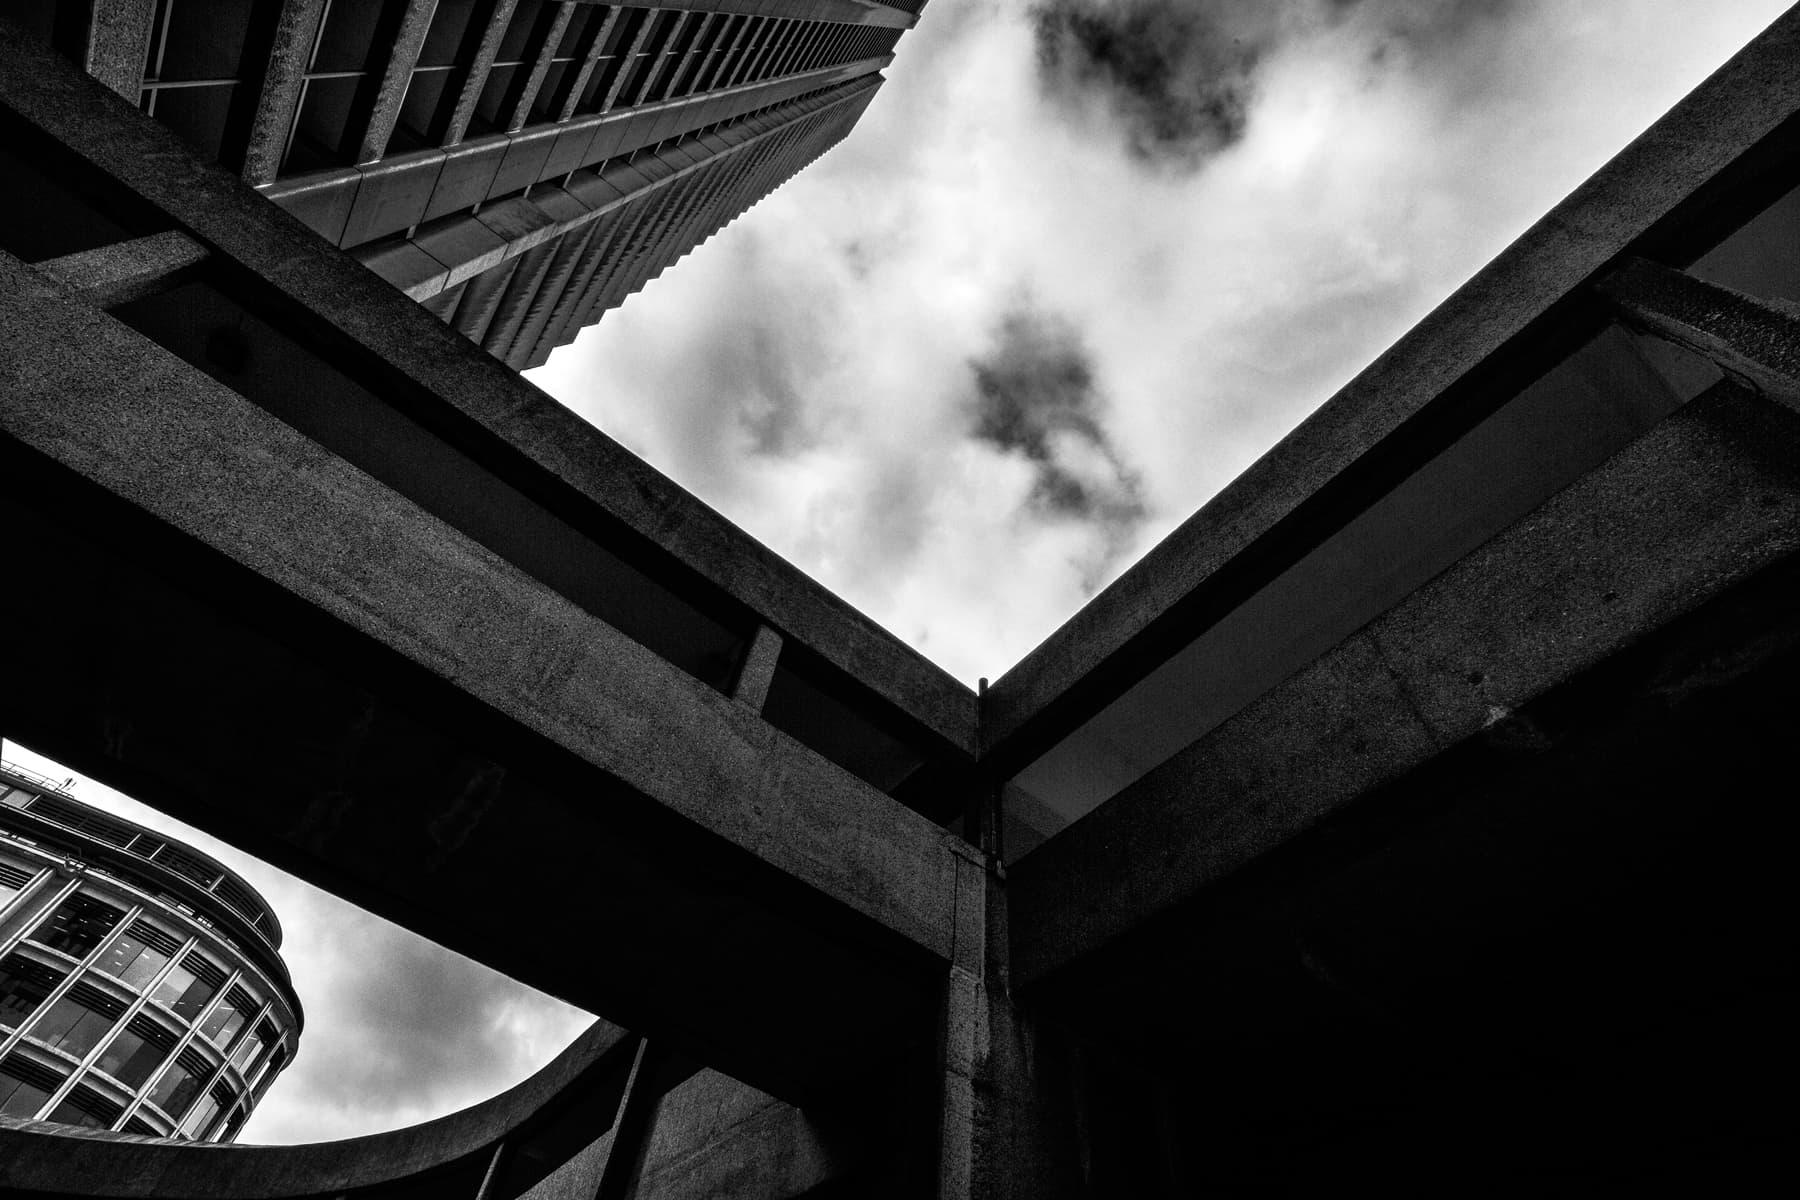 fabio_burrelli_street_photography_architecture_london_CP5B2154.jpg